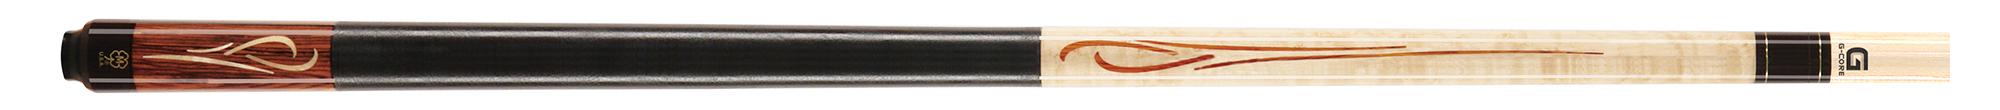 PK3052: McDermott G416 Birdseye/cocobolo pool #1